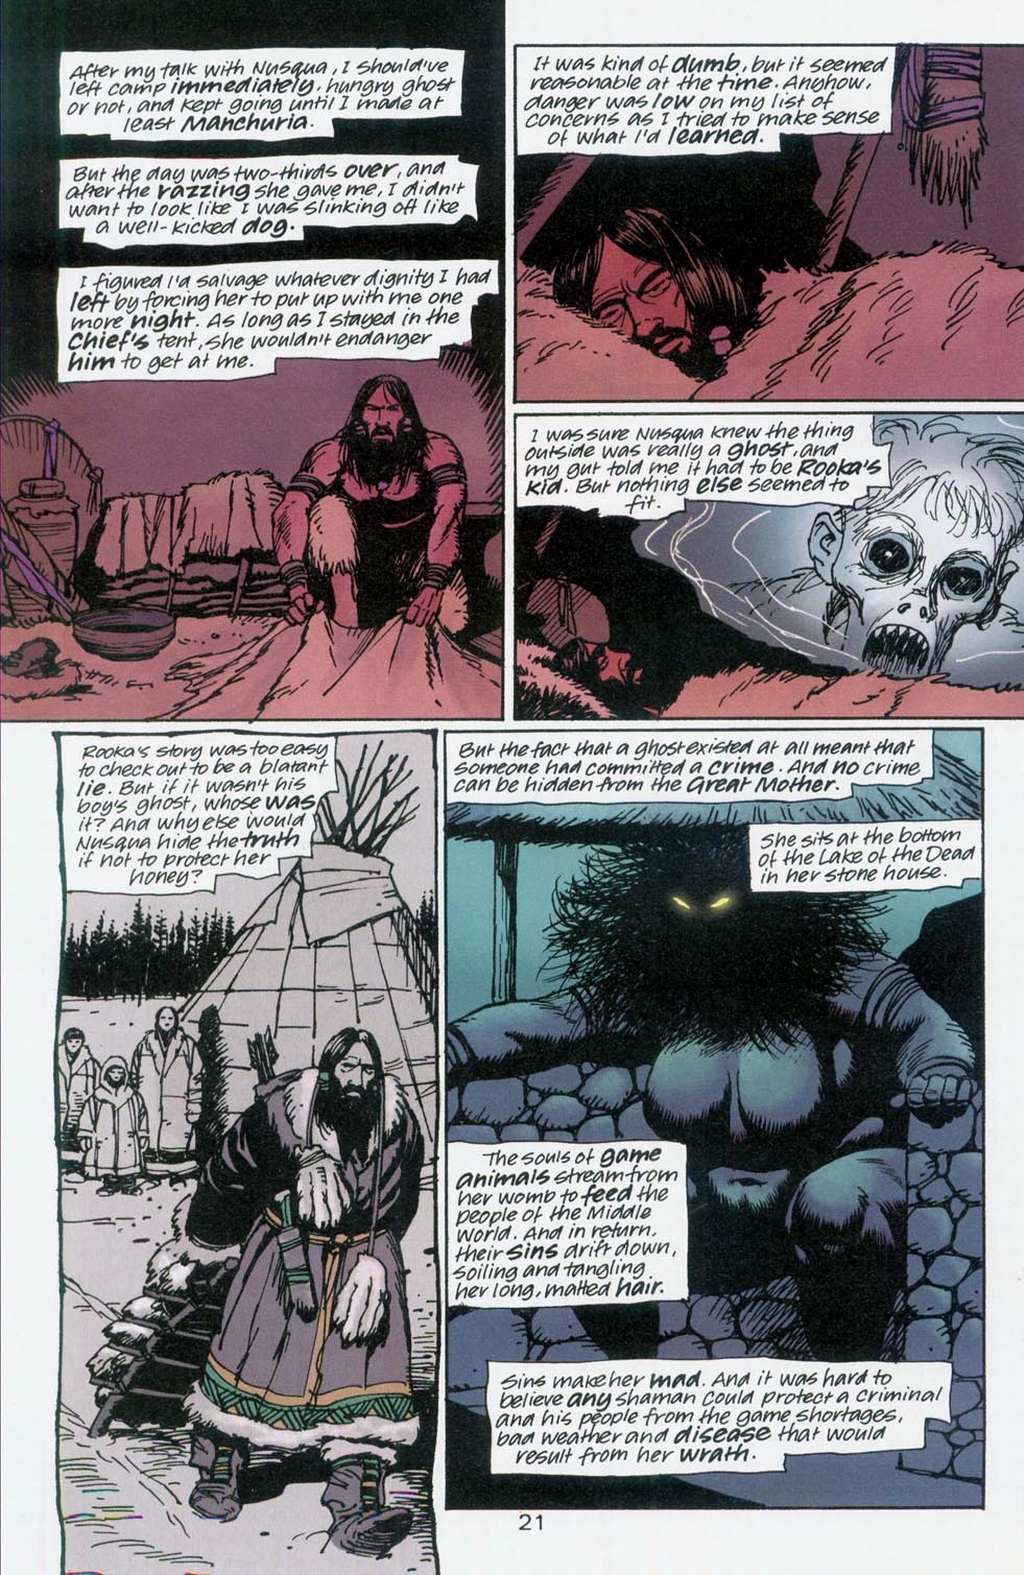 Muktuk Wolfsbreath: Hard-Boiled Shaman issue 1 - Page 21